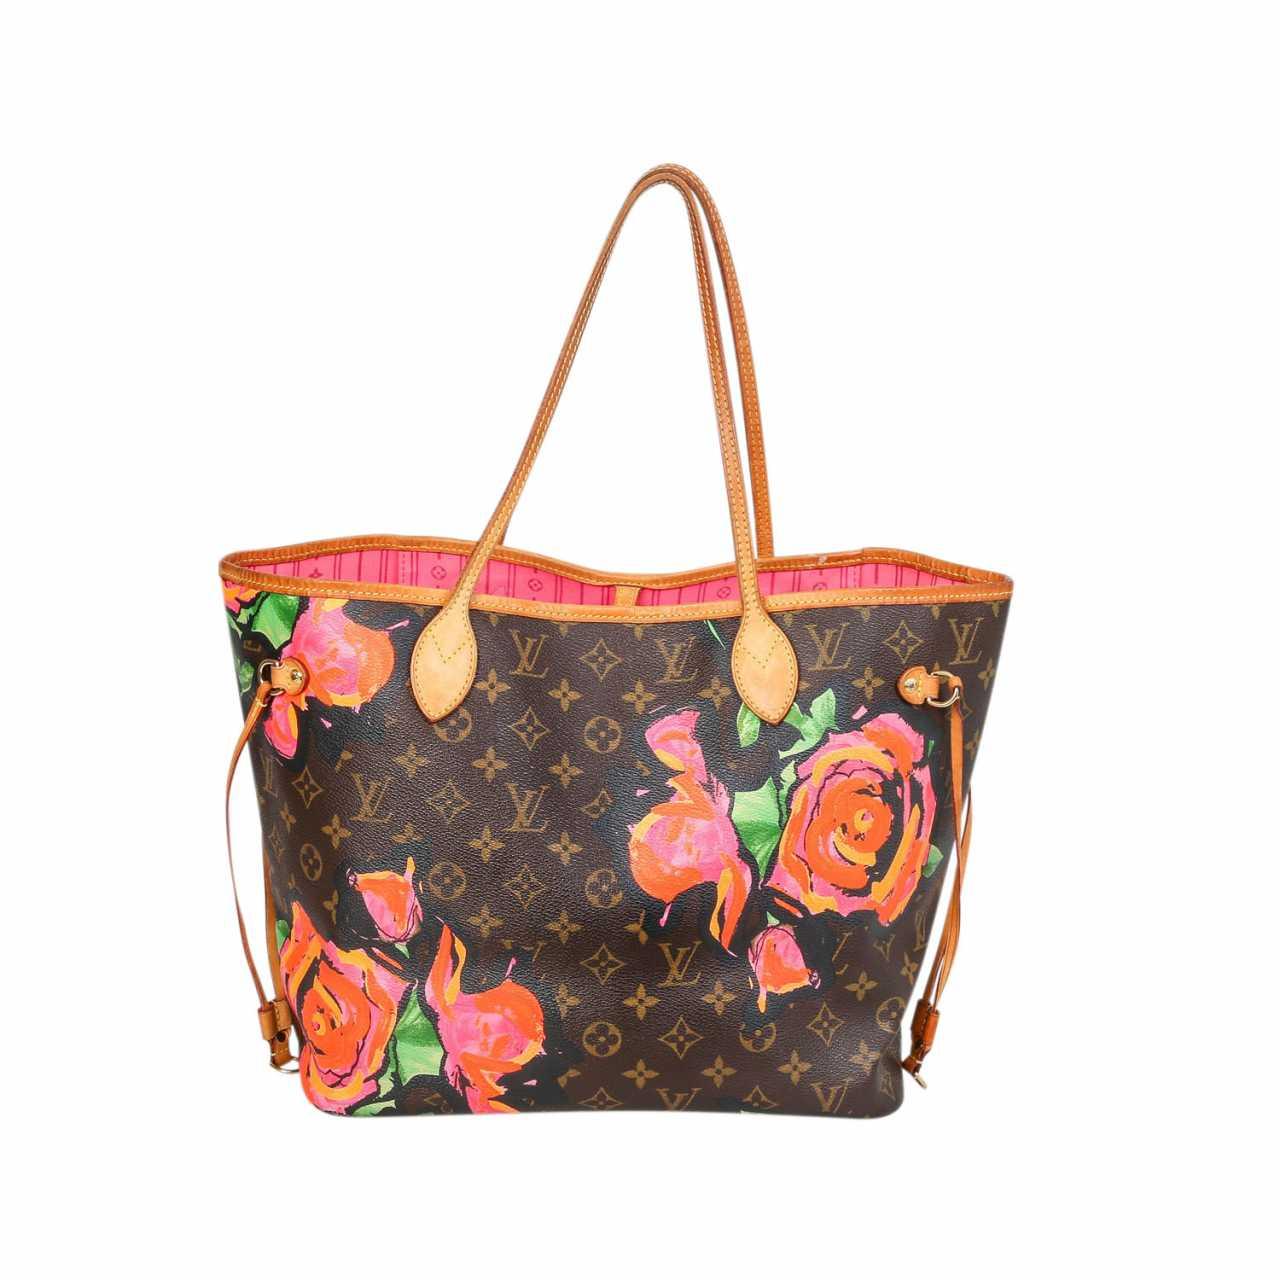 great deals differently detailing LOUIS VUITTON shopper tote bag